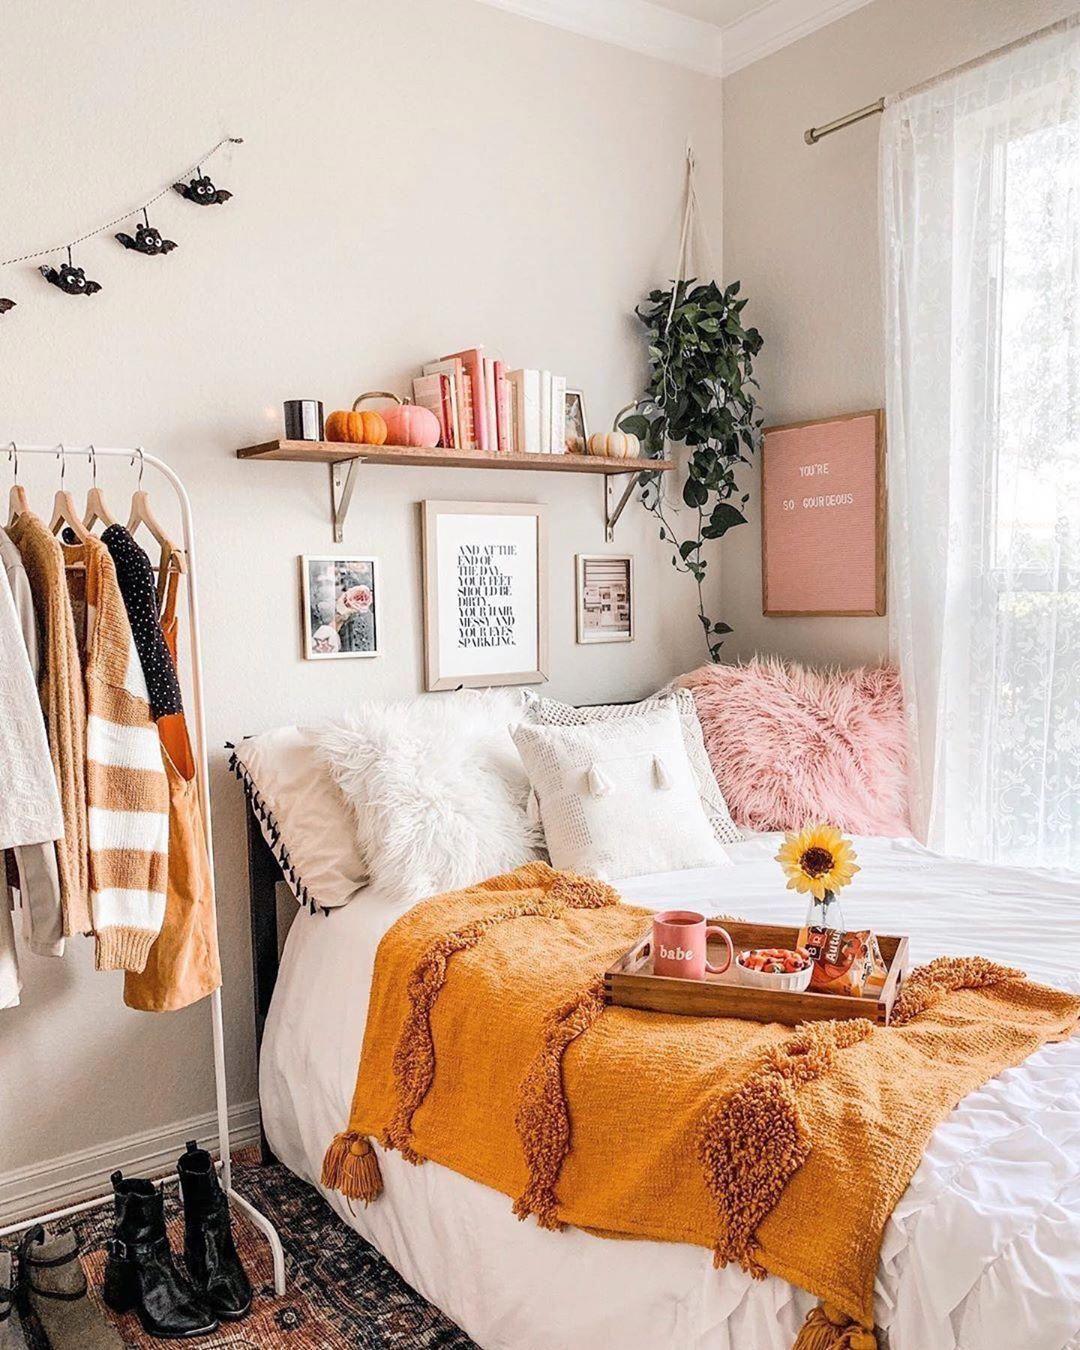 -   - #antiquedecor #apartmentdecor #bedroomdecor #diydecor #homedecor #housedecor #livingroomdecor #moderndecor